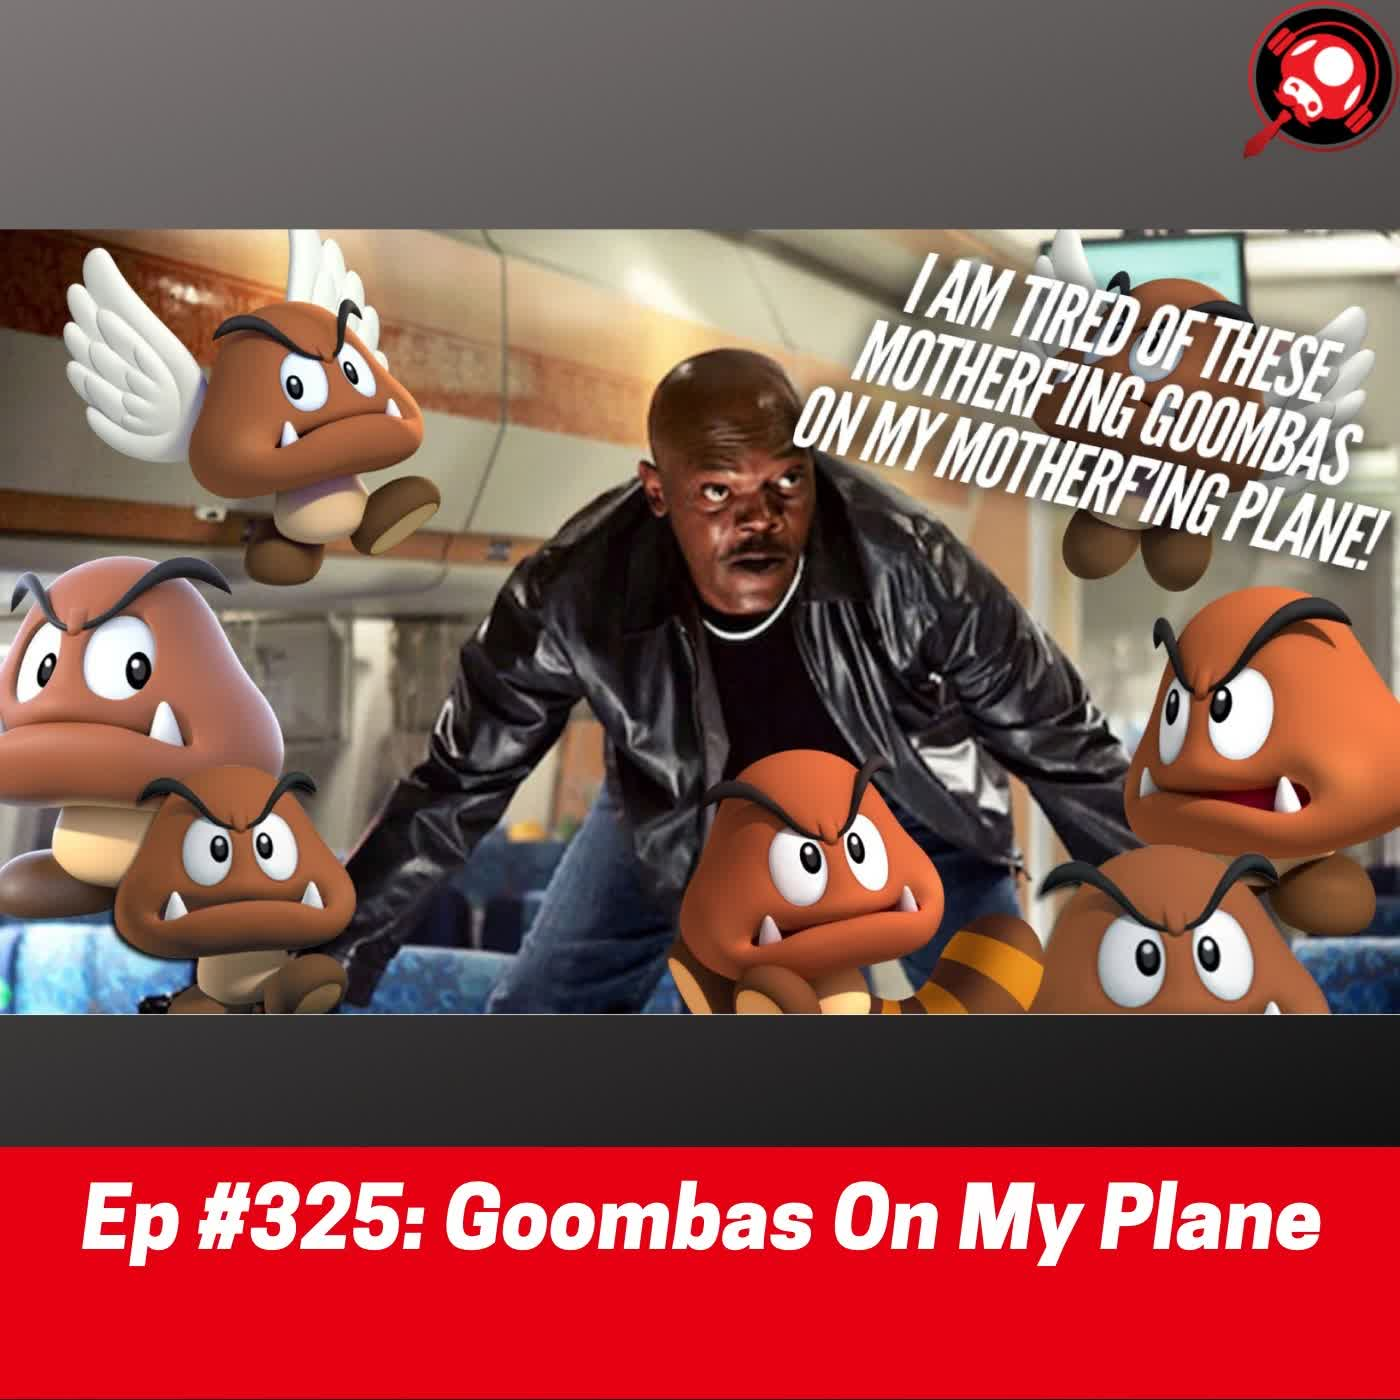 #325: Goombas On My Plane